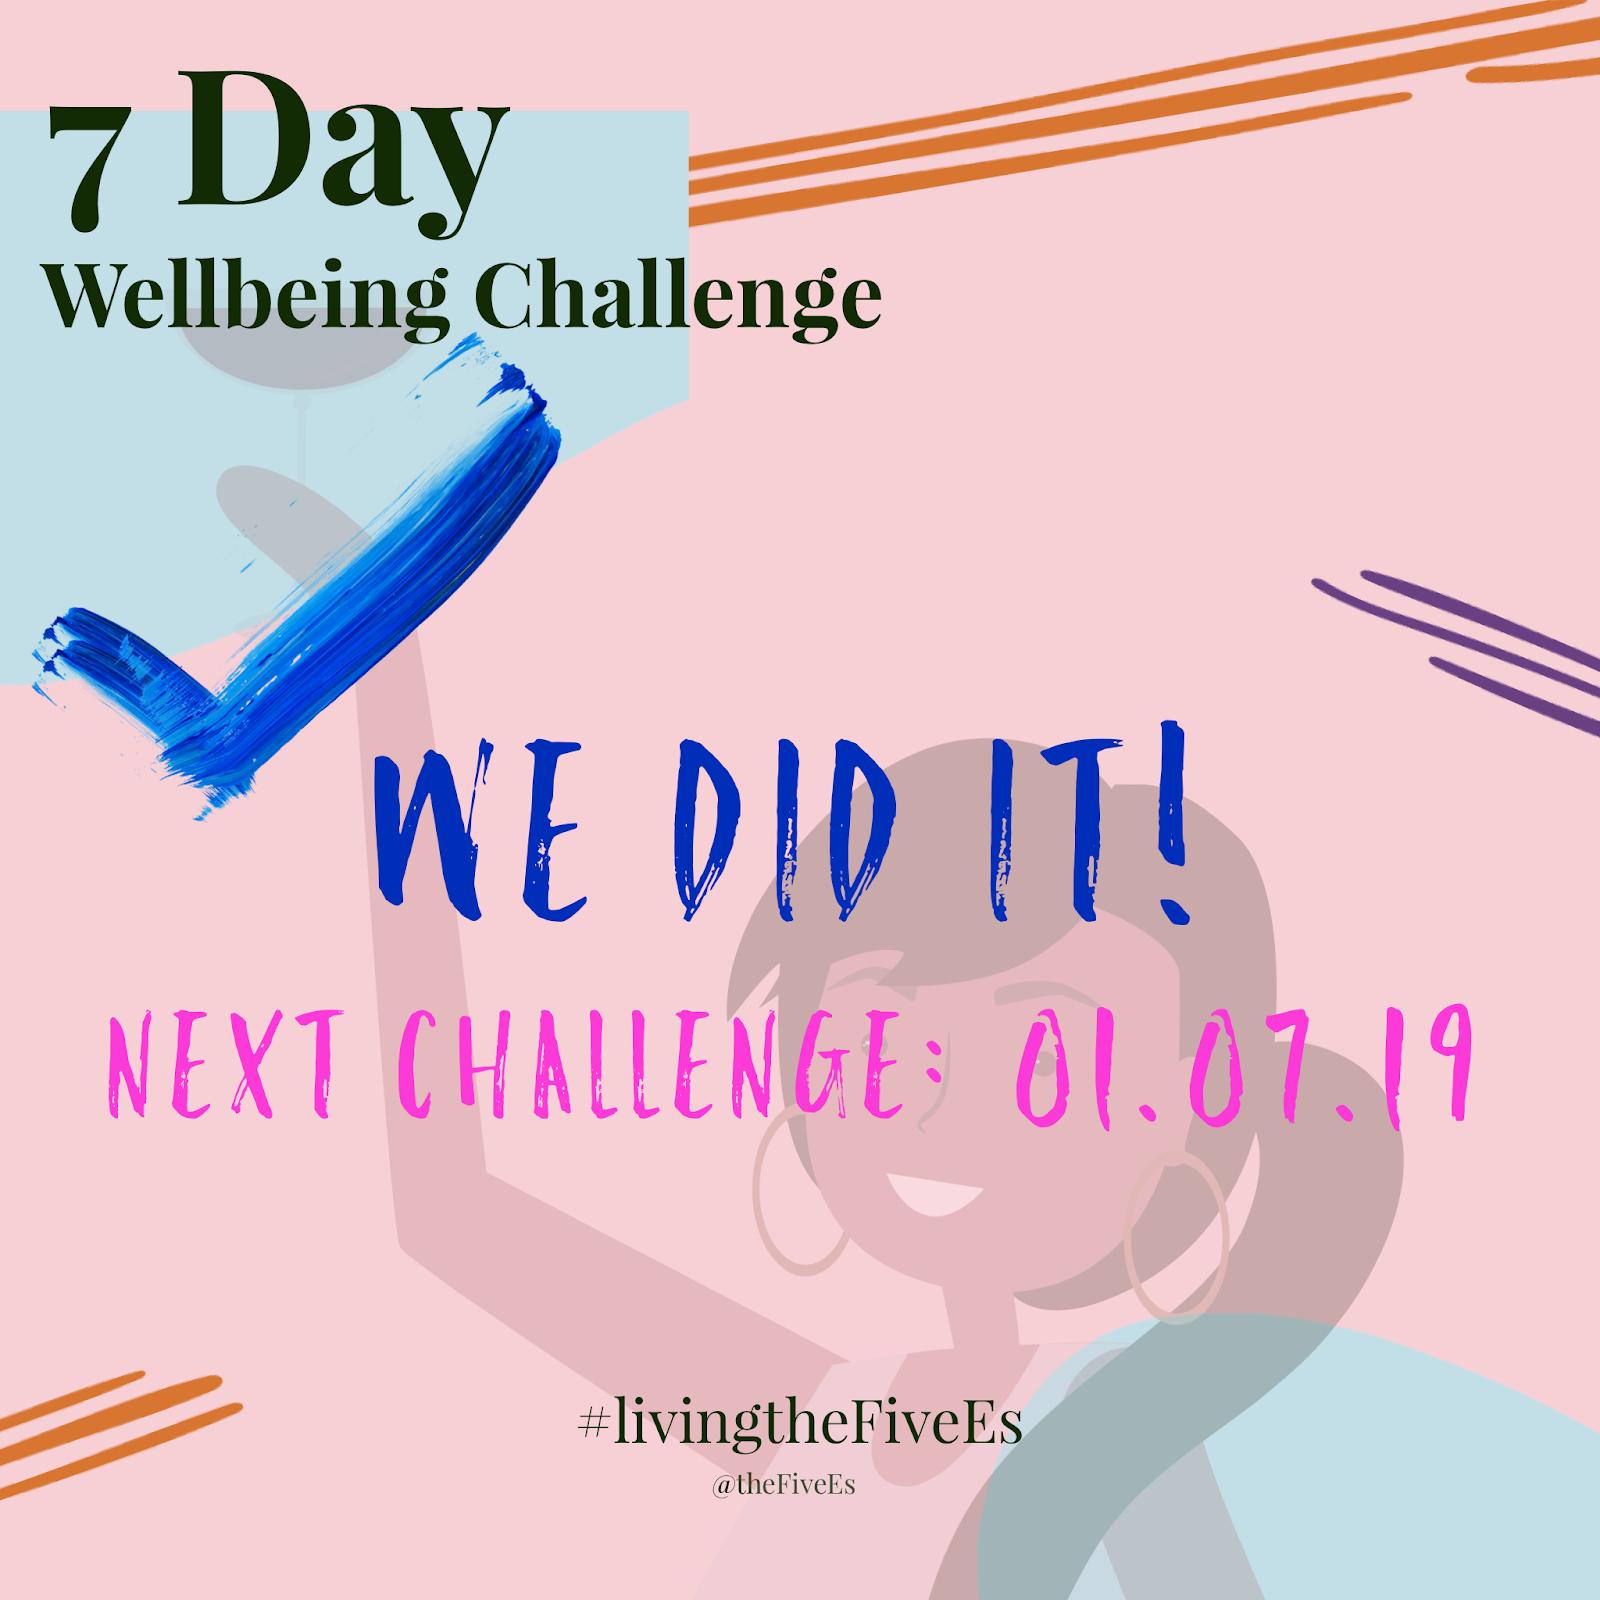 Wellbeing Challenge